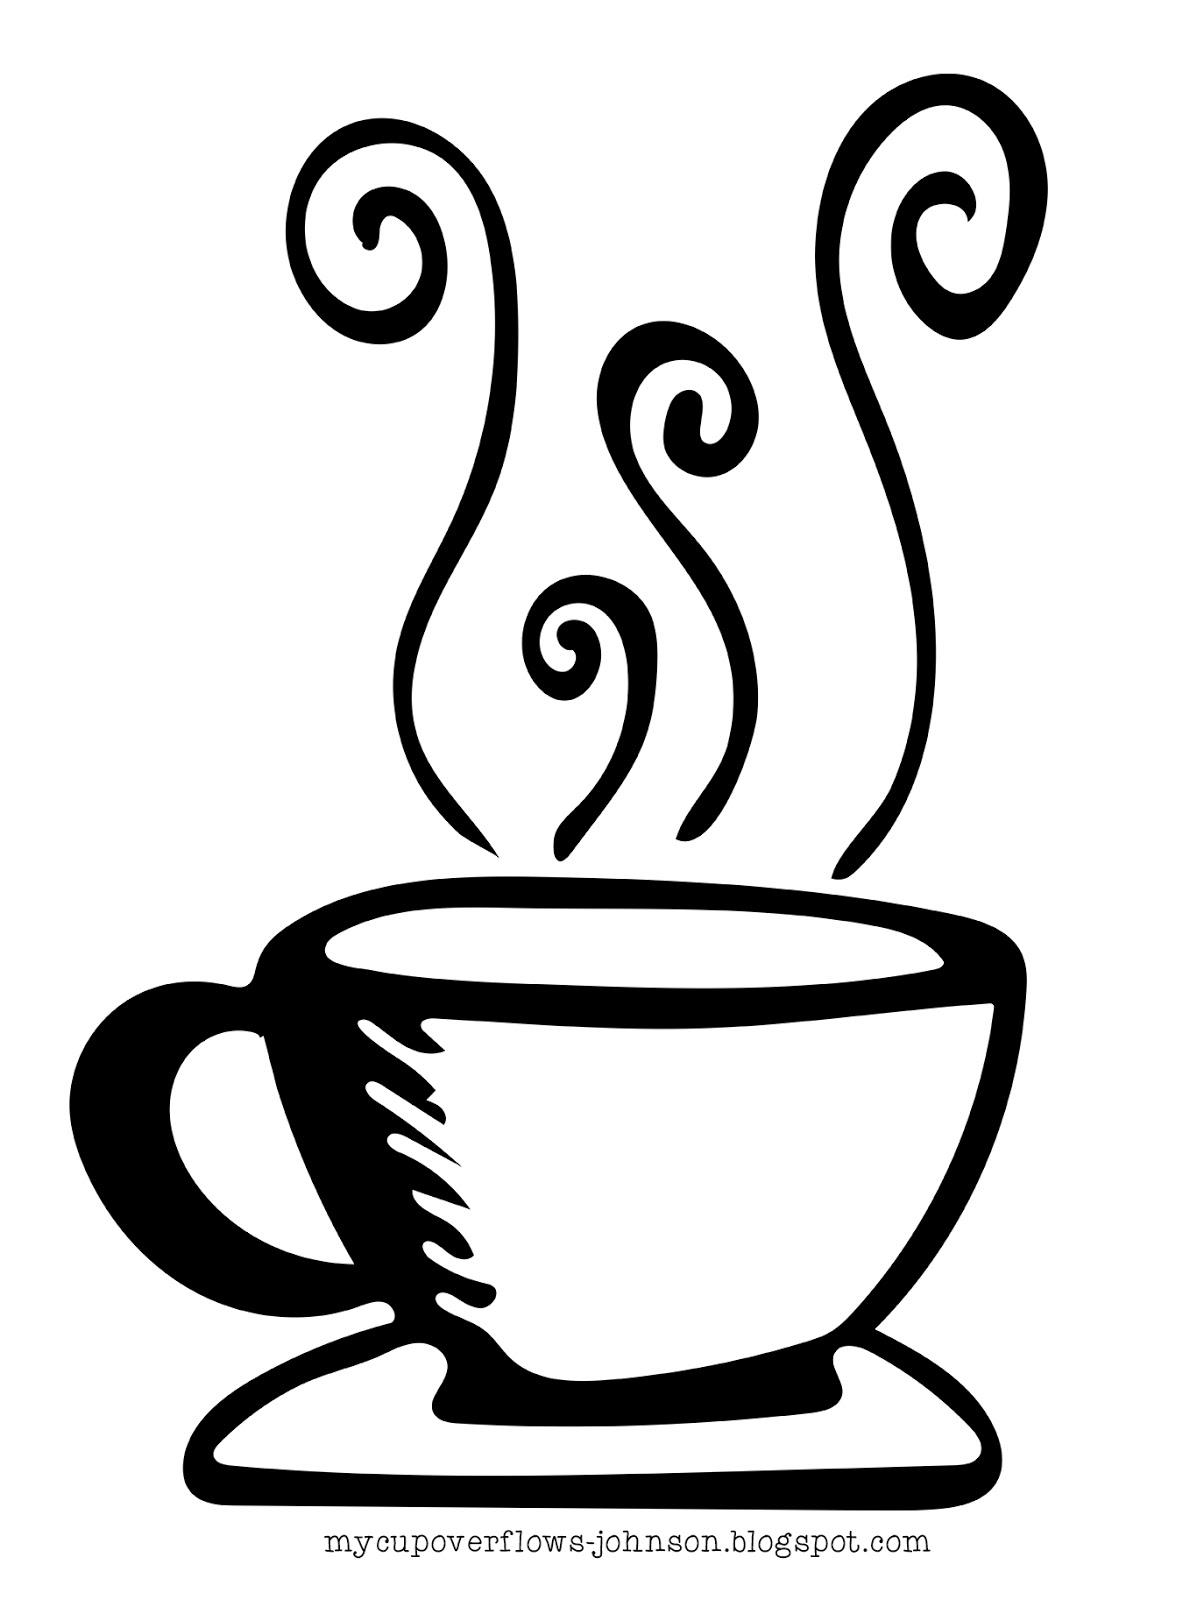 My Cup Overflows Tea And Coffee